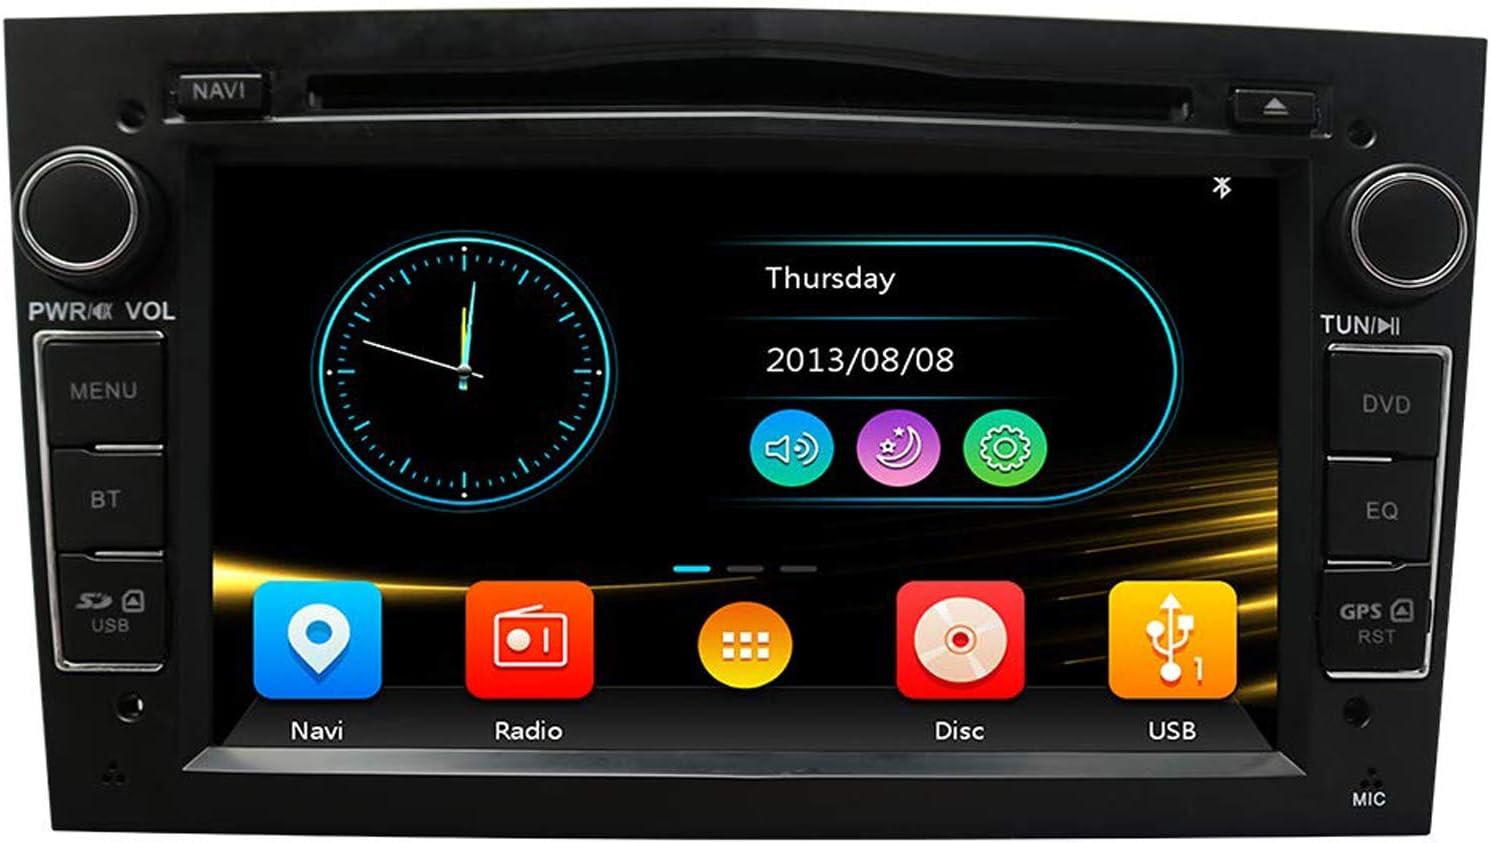 Autoradio In Dash Head Unit Navigation Für Opel Vauxhall Corsa Vectra Antara Meriva Astra Vivaro Zafira 7 Zoll Touchscreen 2 Din Bluetooth Mit Rückfahrkamera 16 Gb Sd Karte 3 5 Mm Mikrofon Navigation